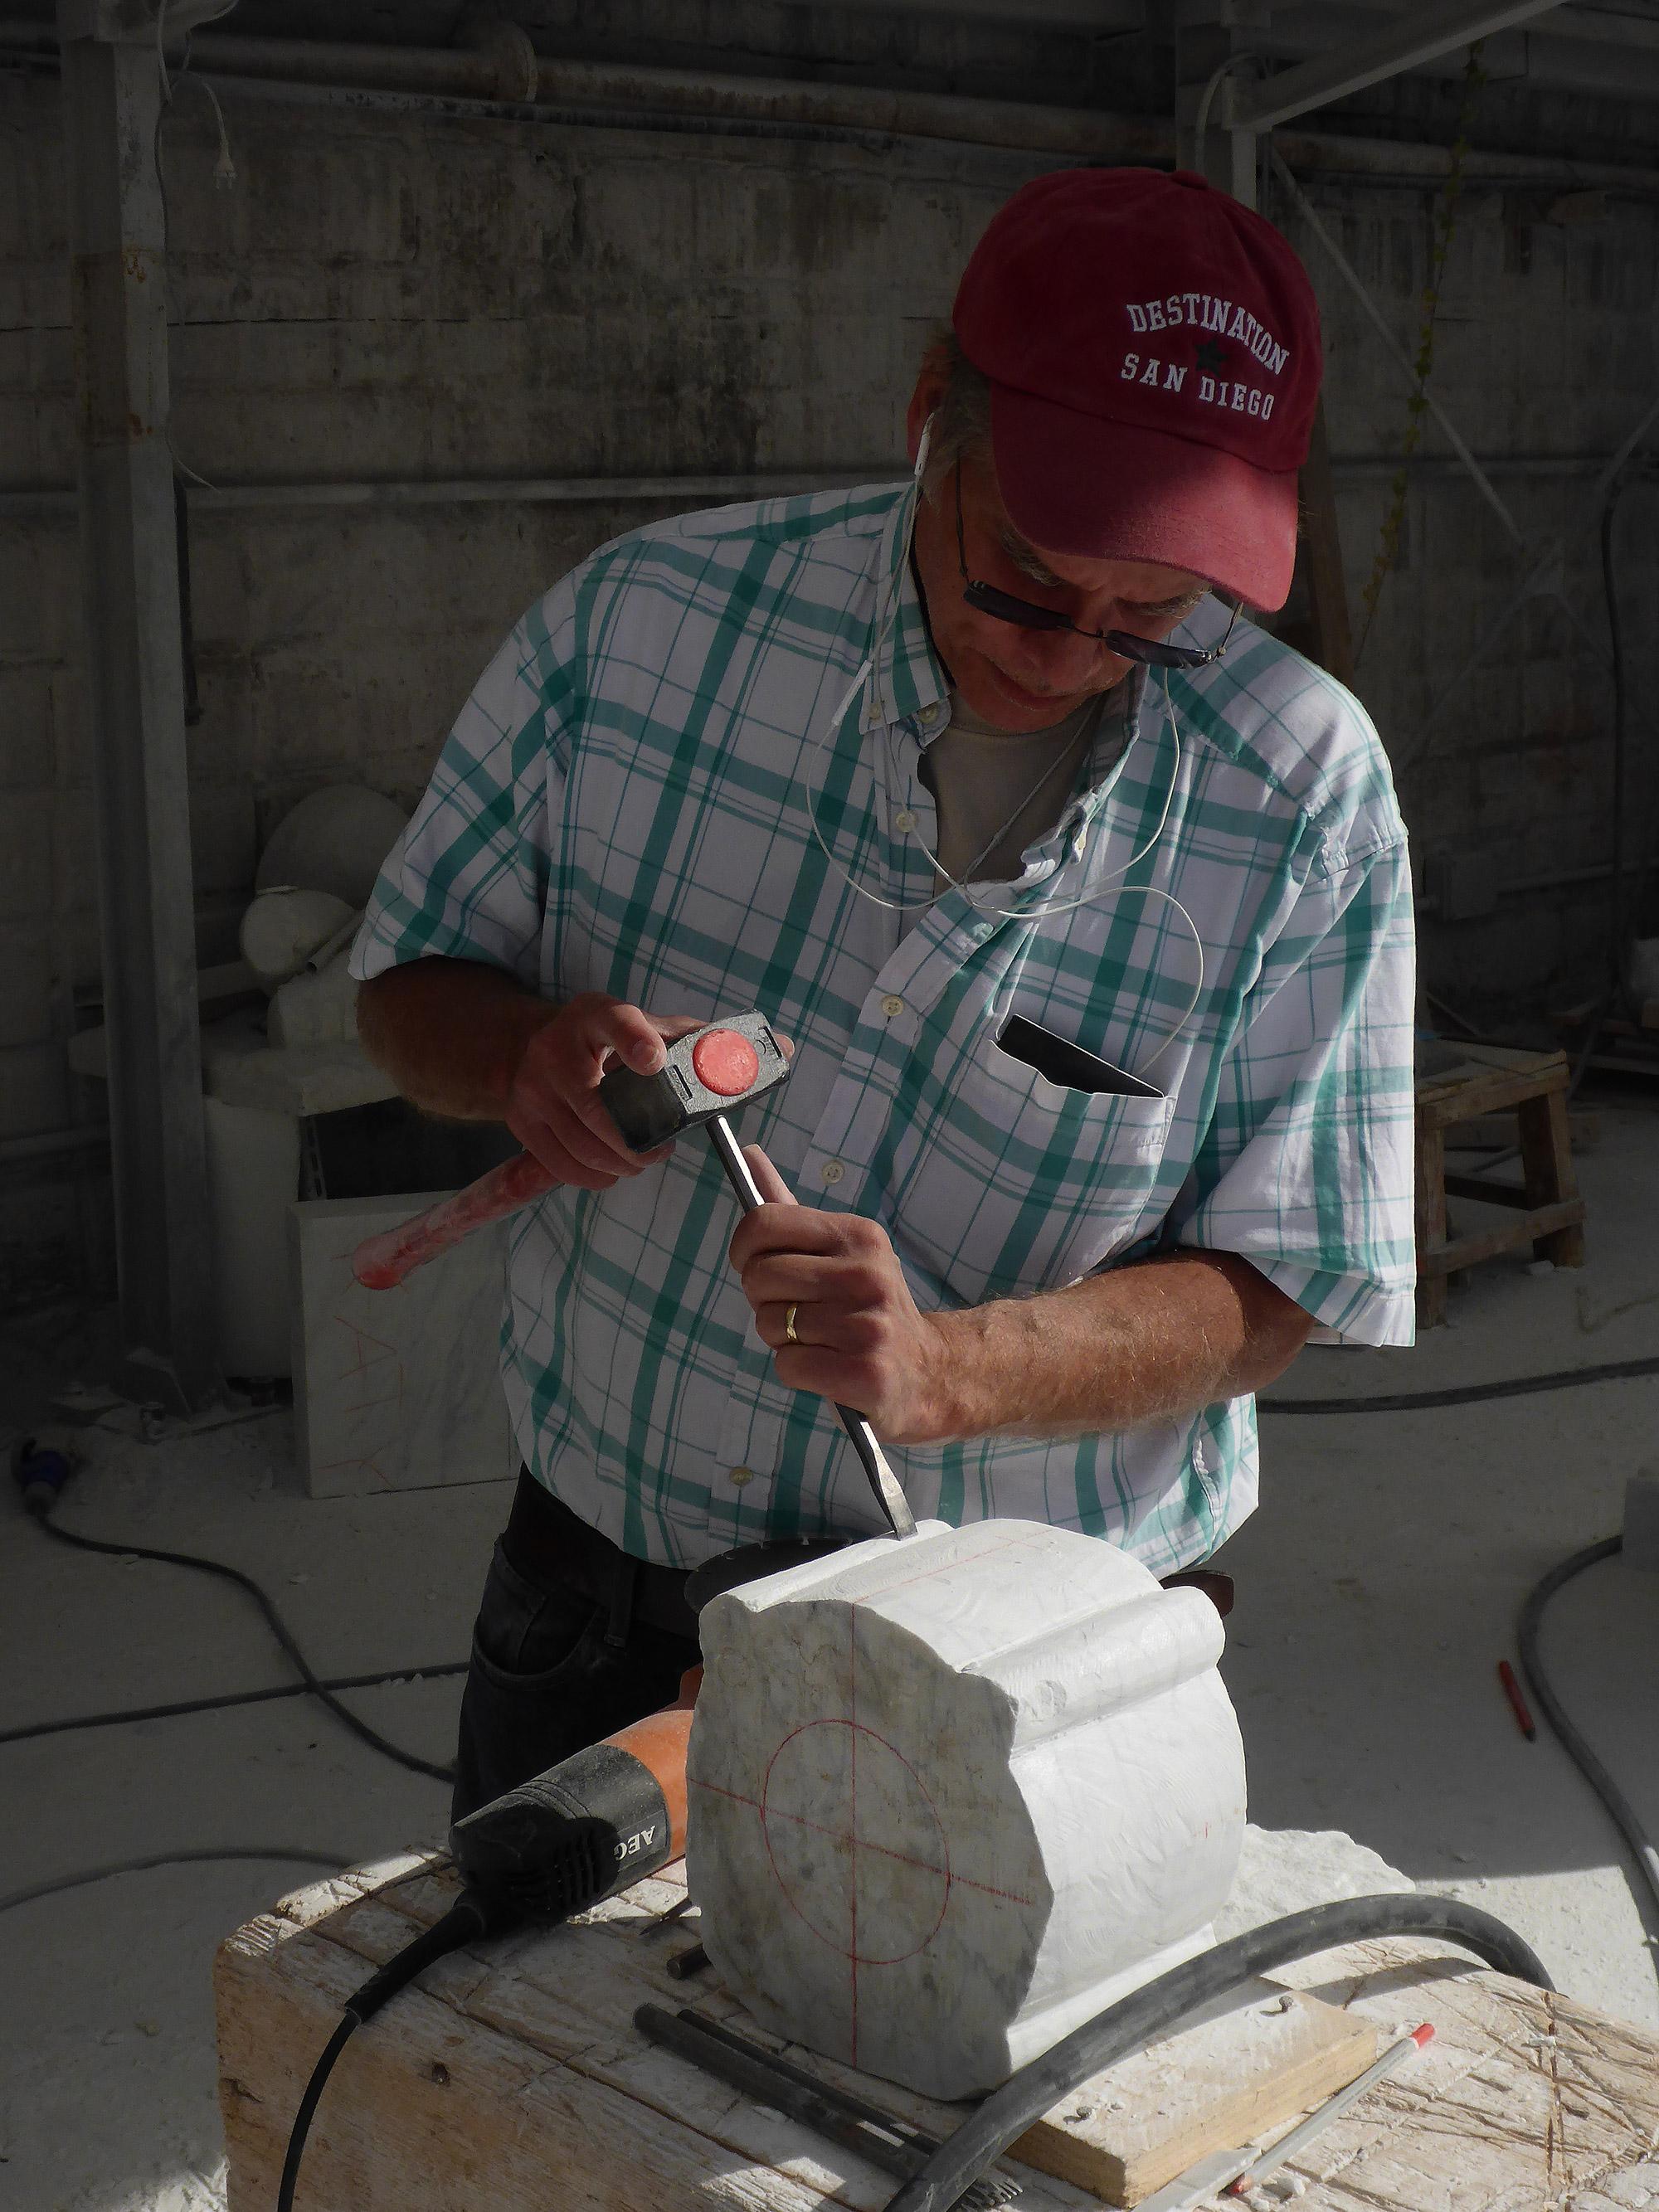 Bill-Dickinson-Carving-Marble.jpg